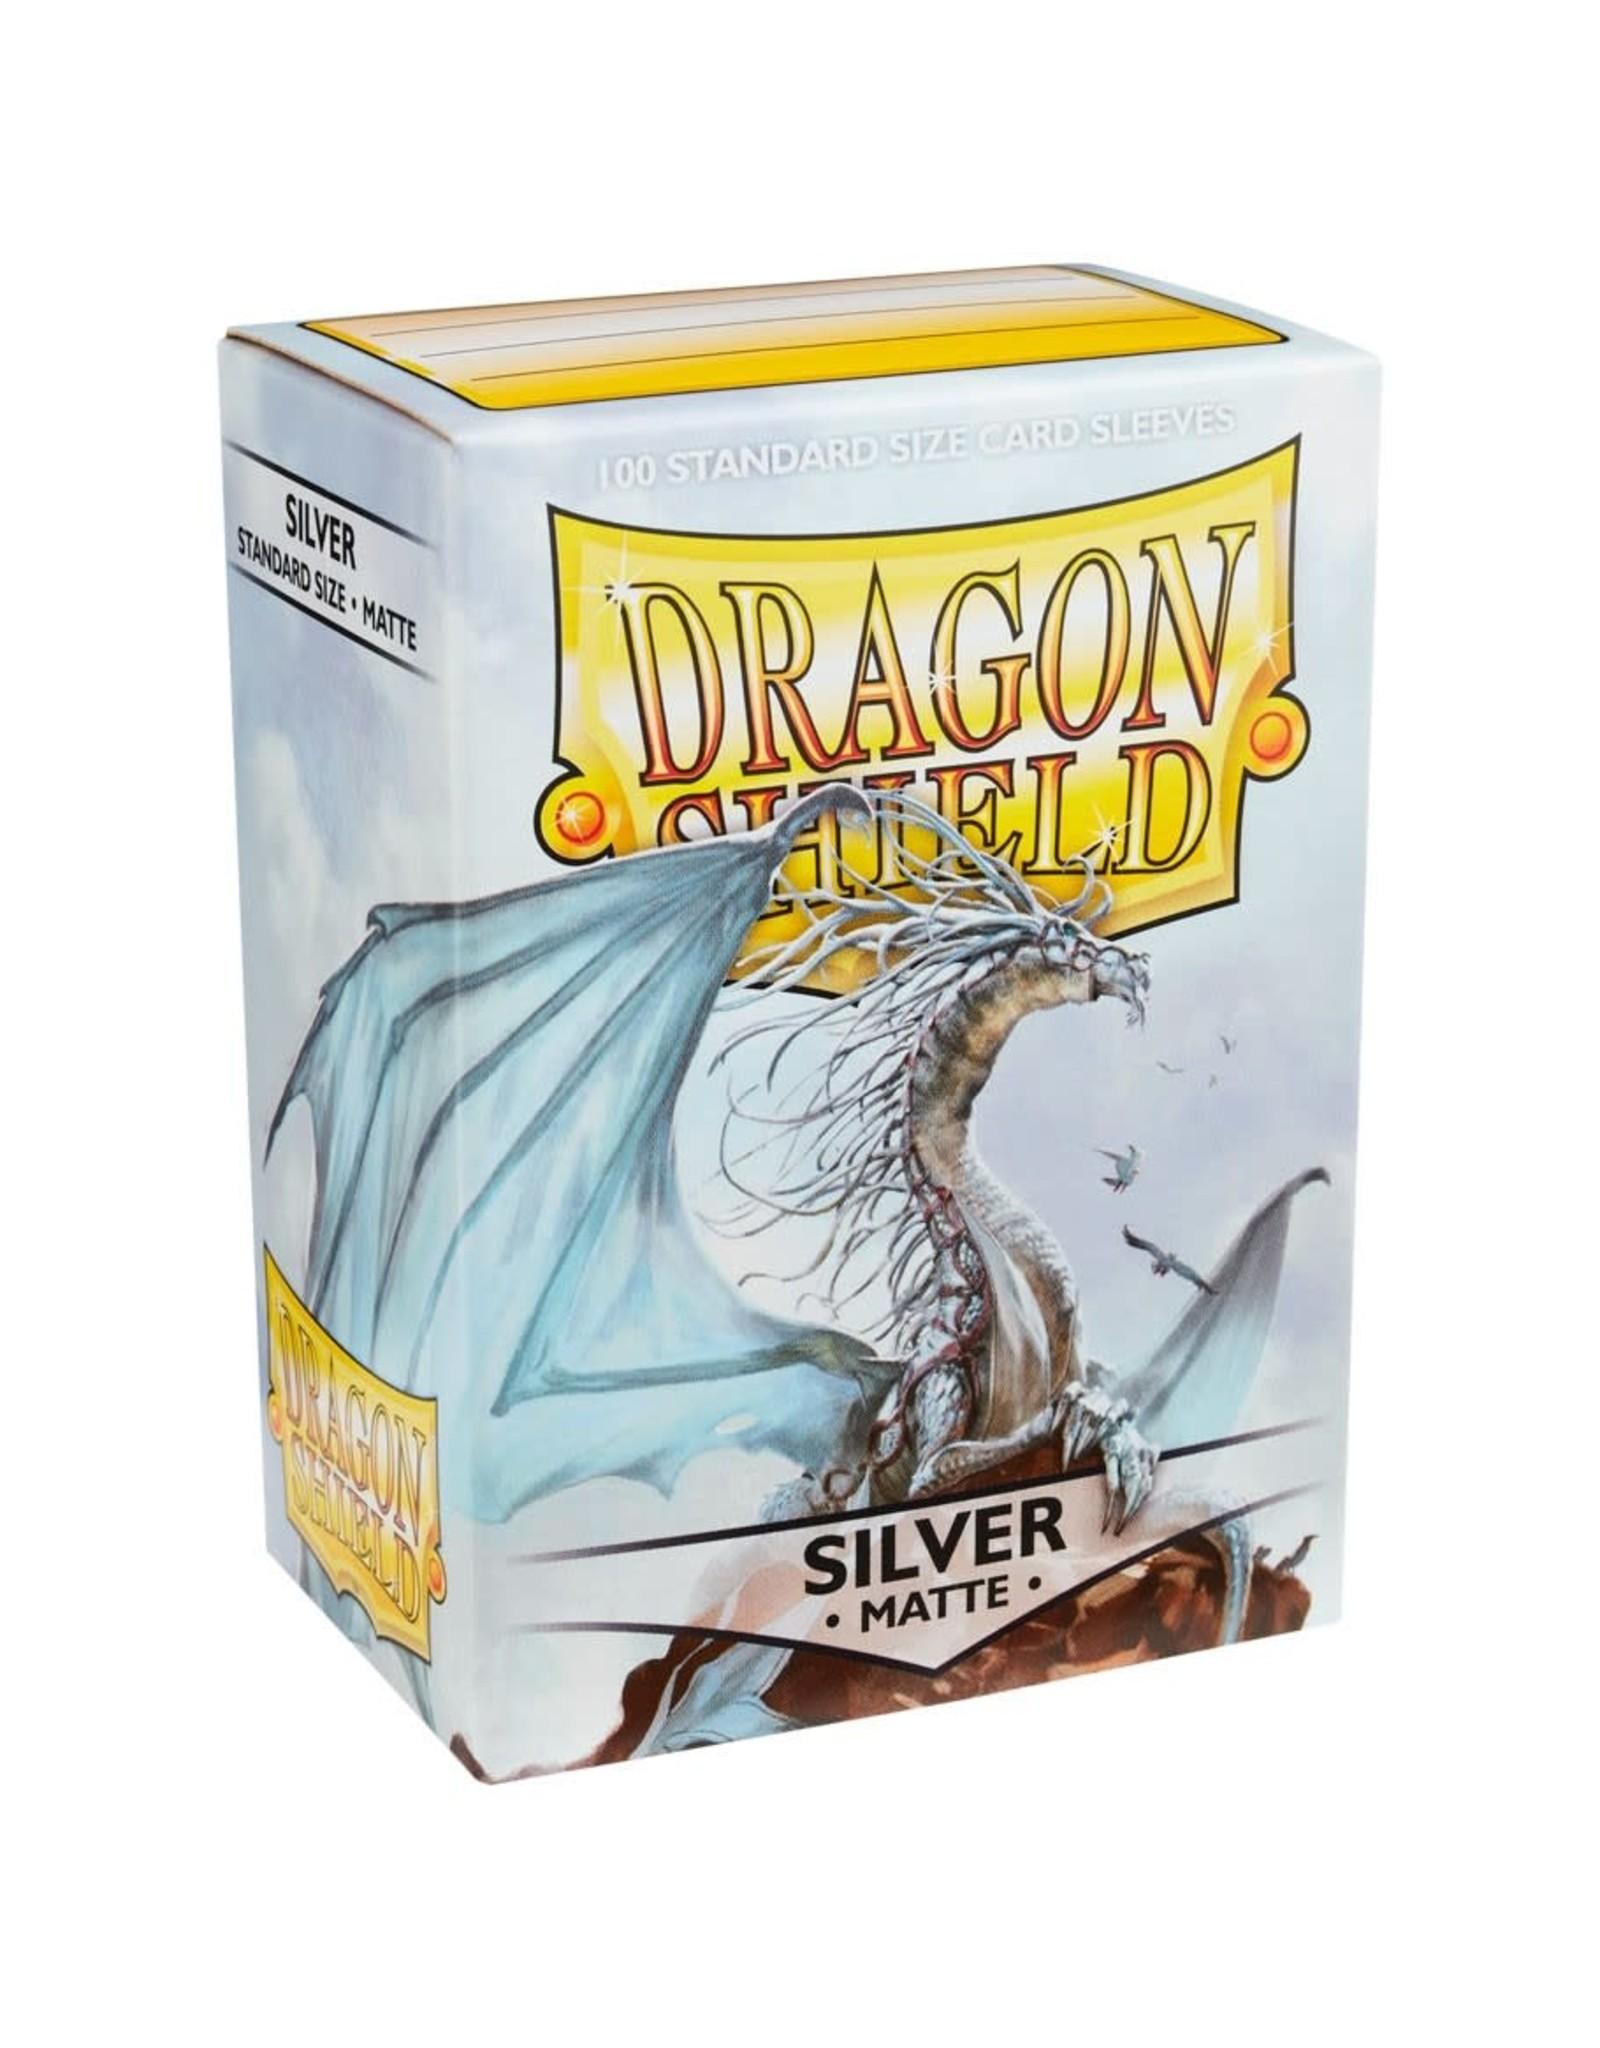 Dragon Shield Dragon Shield Matte Silver Card Sleeves (100)